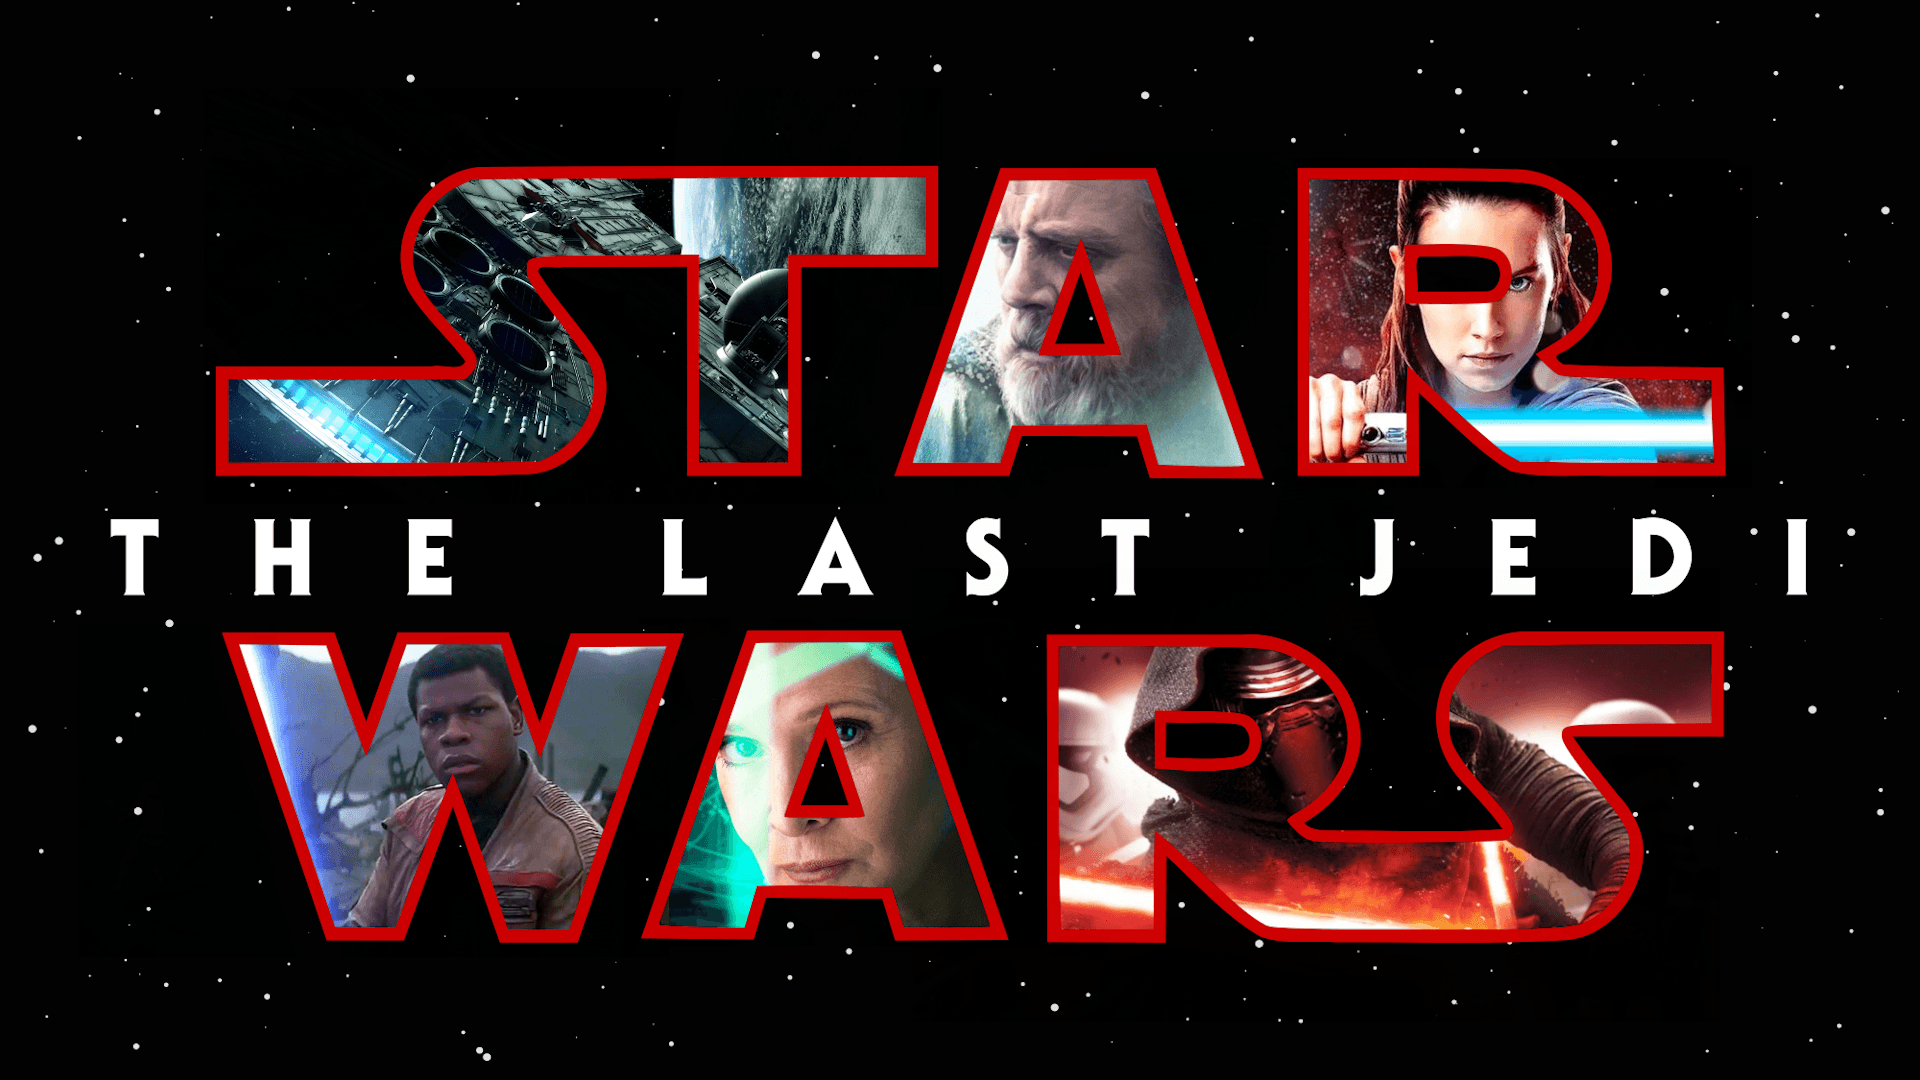 Star Wars The Last Jedi Wallpapers Wallpaper Cave